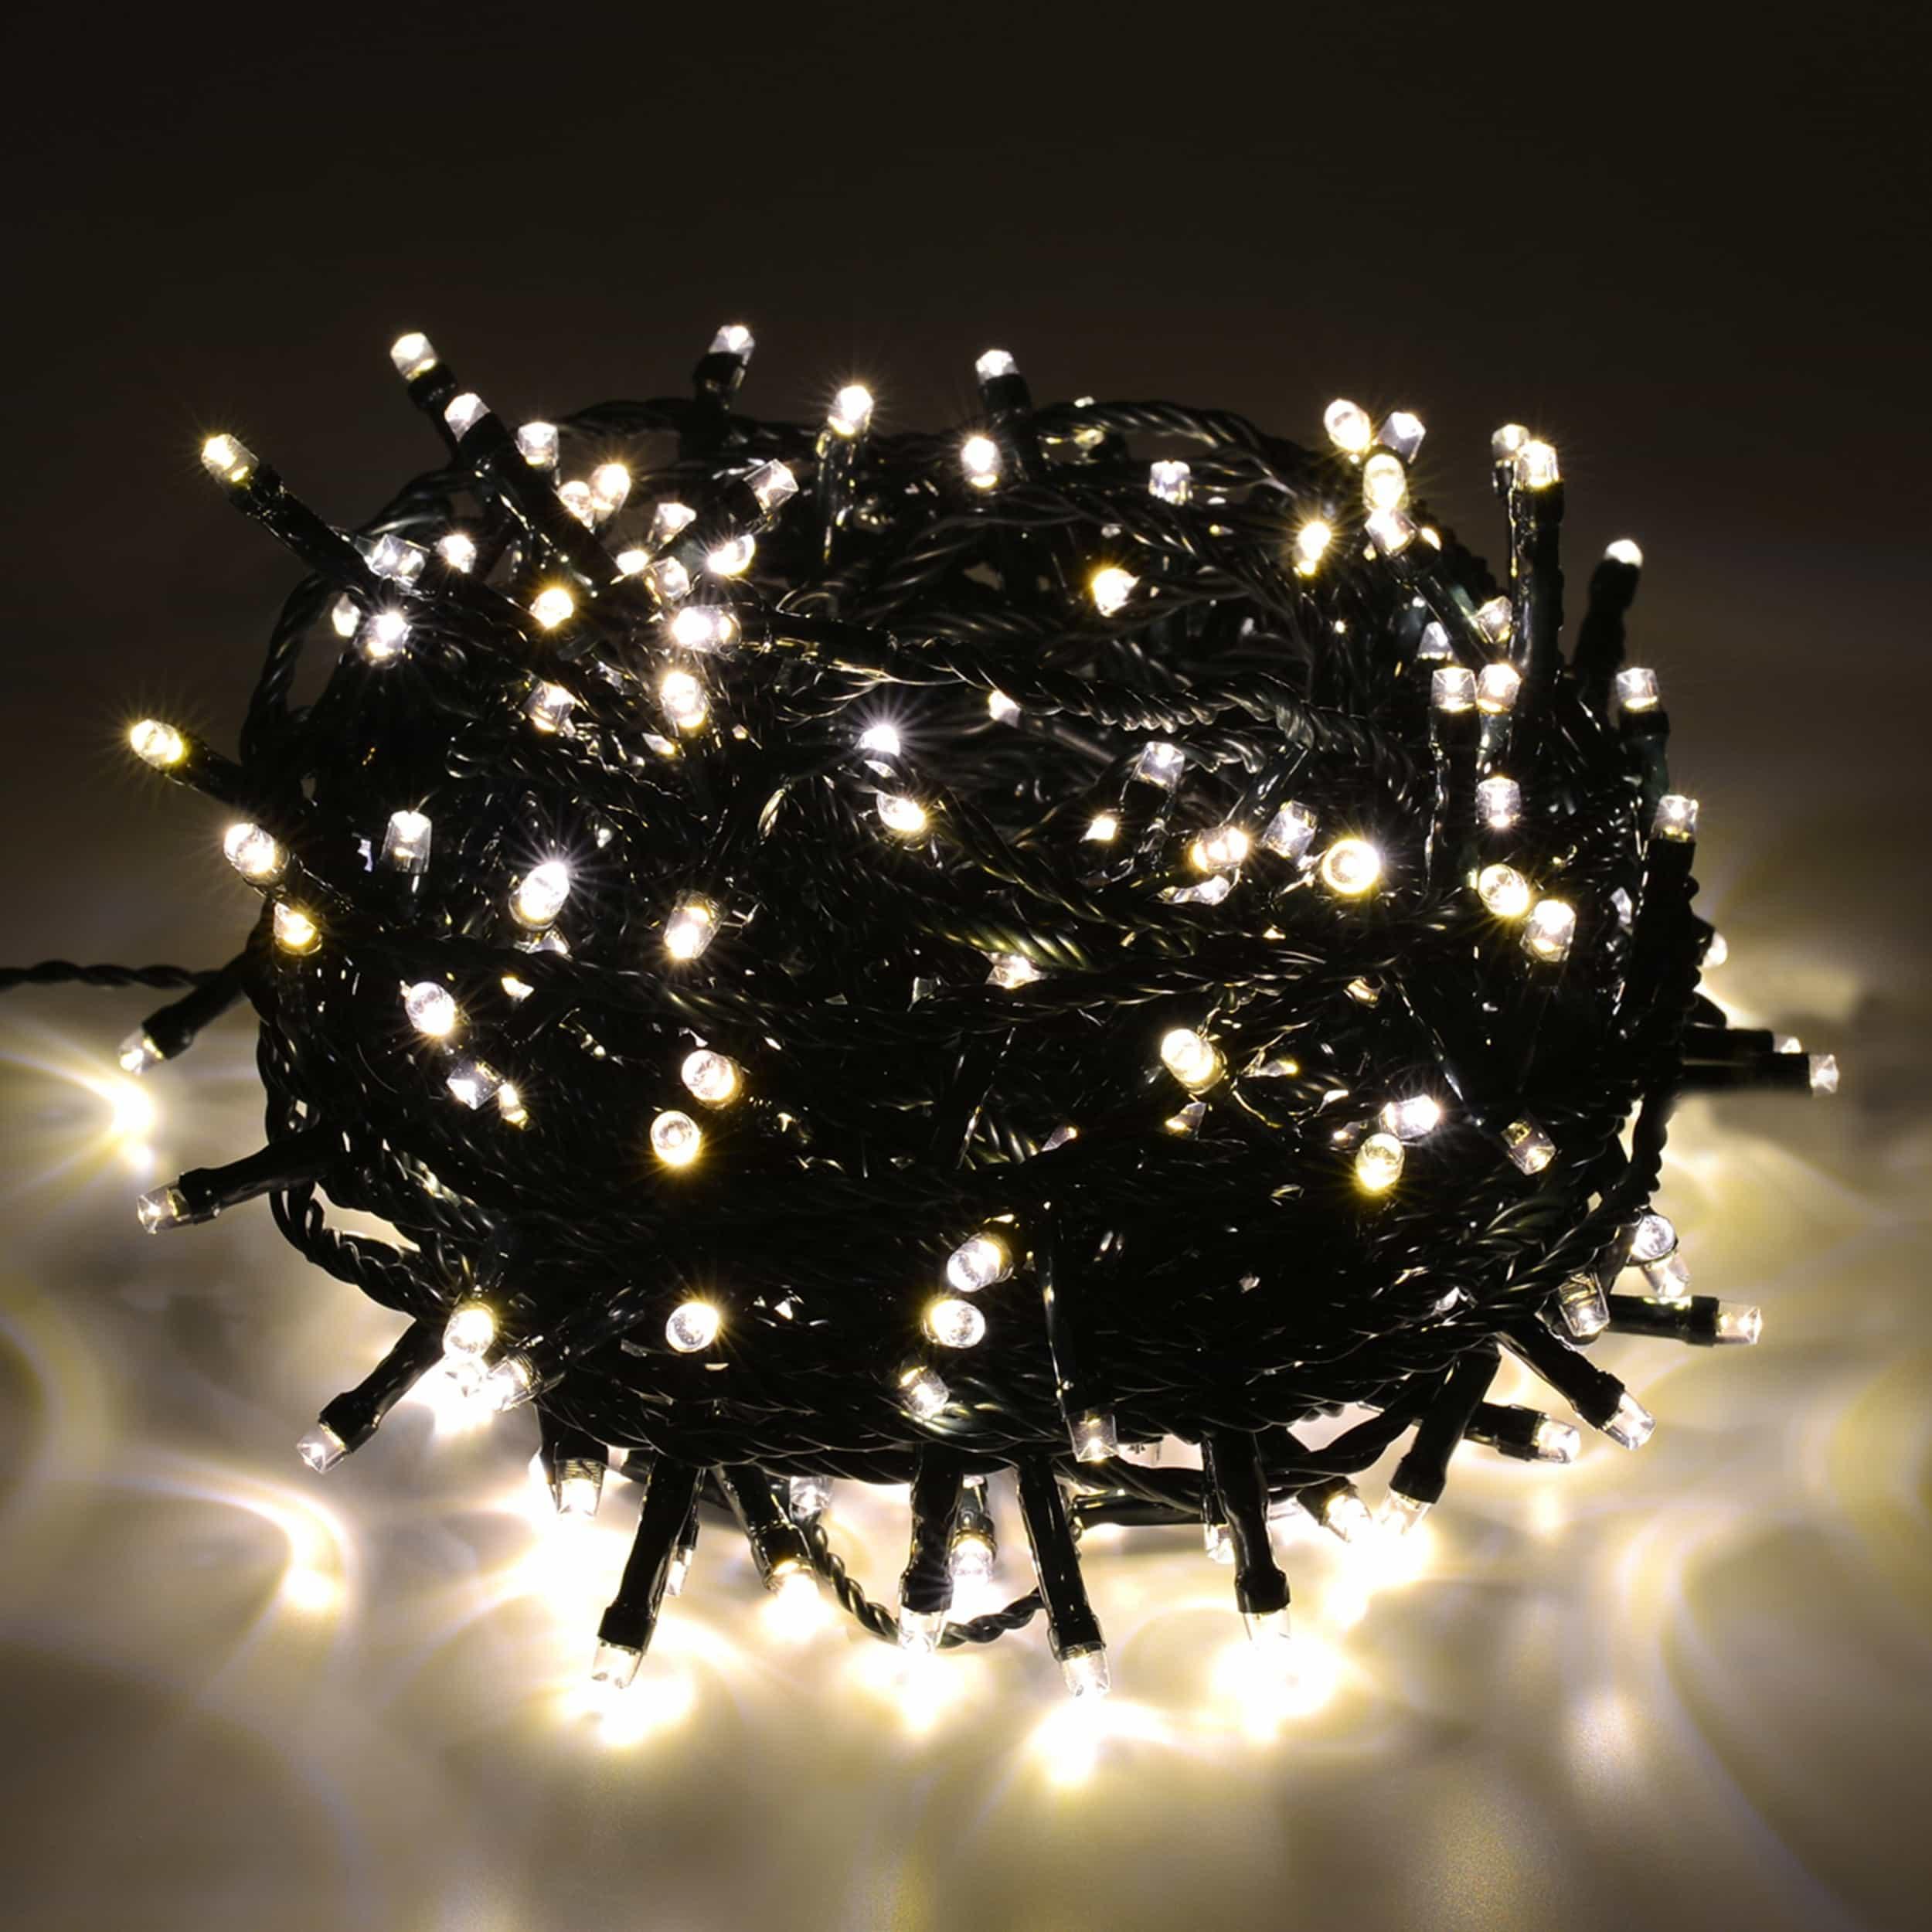 LED Lichterkette 300 LED energiesparend L15m warmweiß